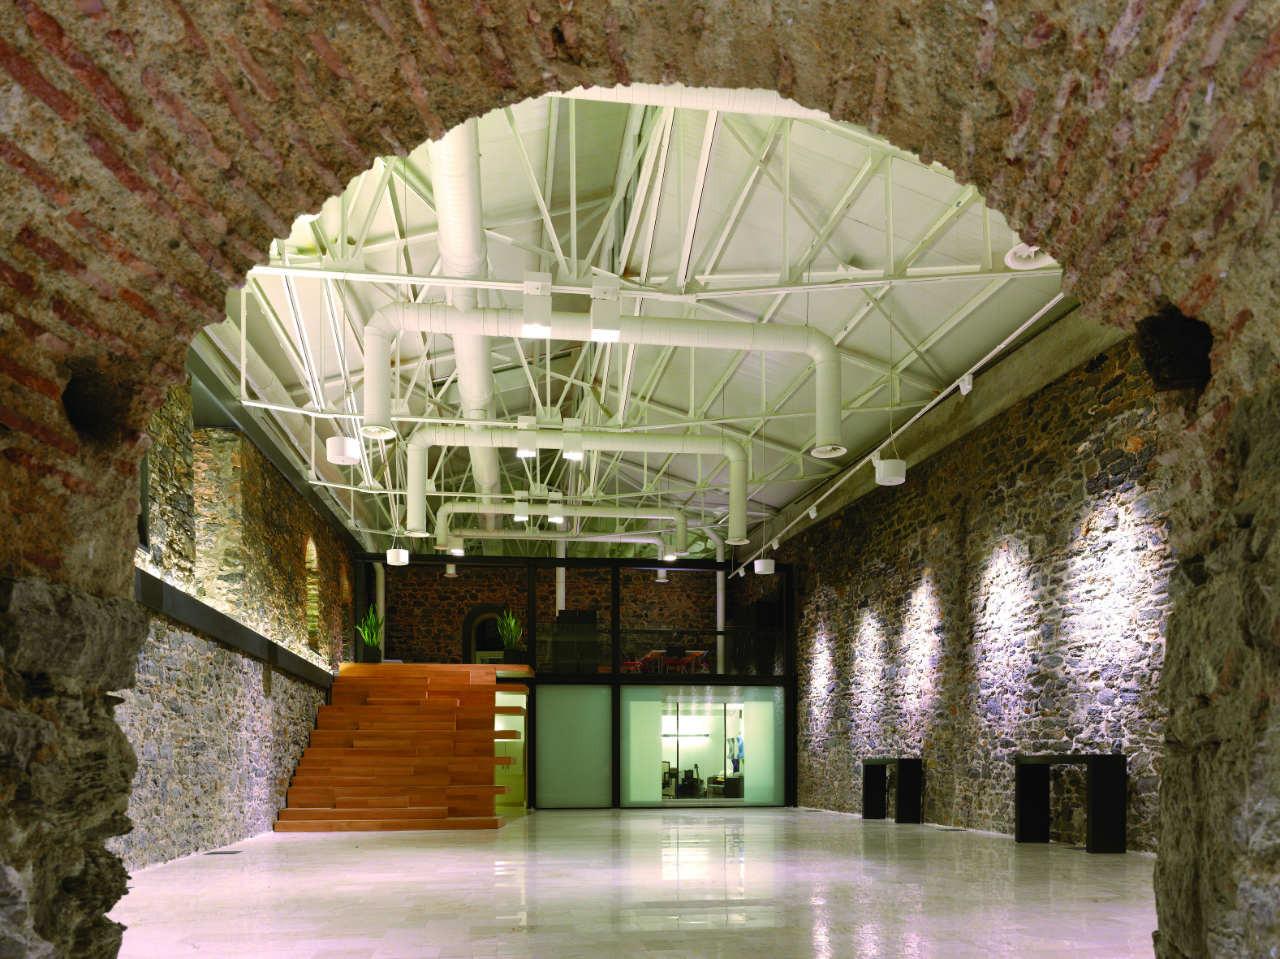 Salt Repository / Erginoğlu & Çalışlar Architects, © Cemal Emden